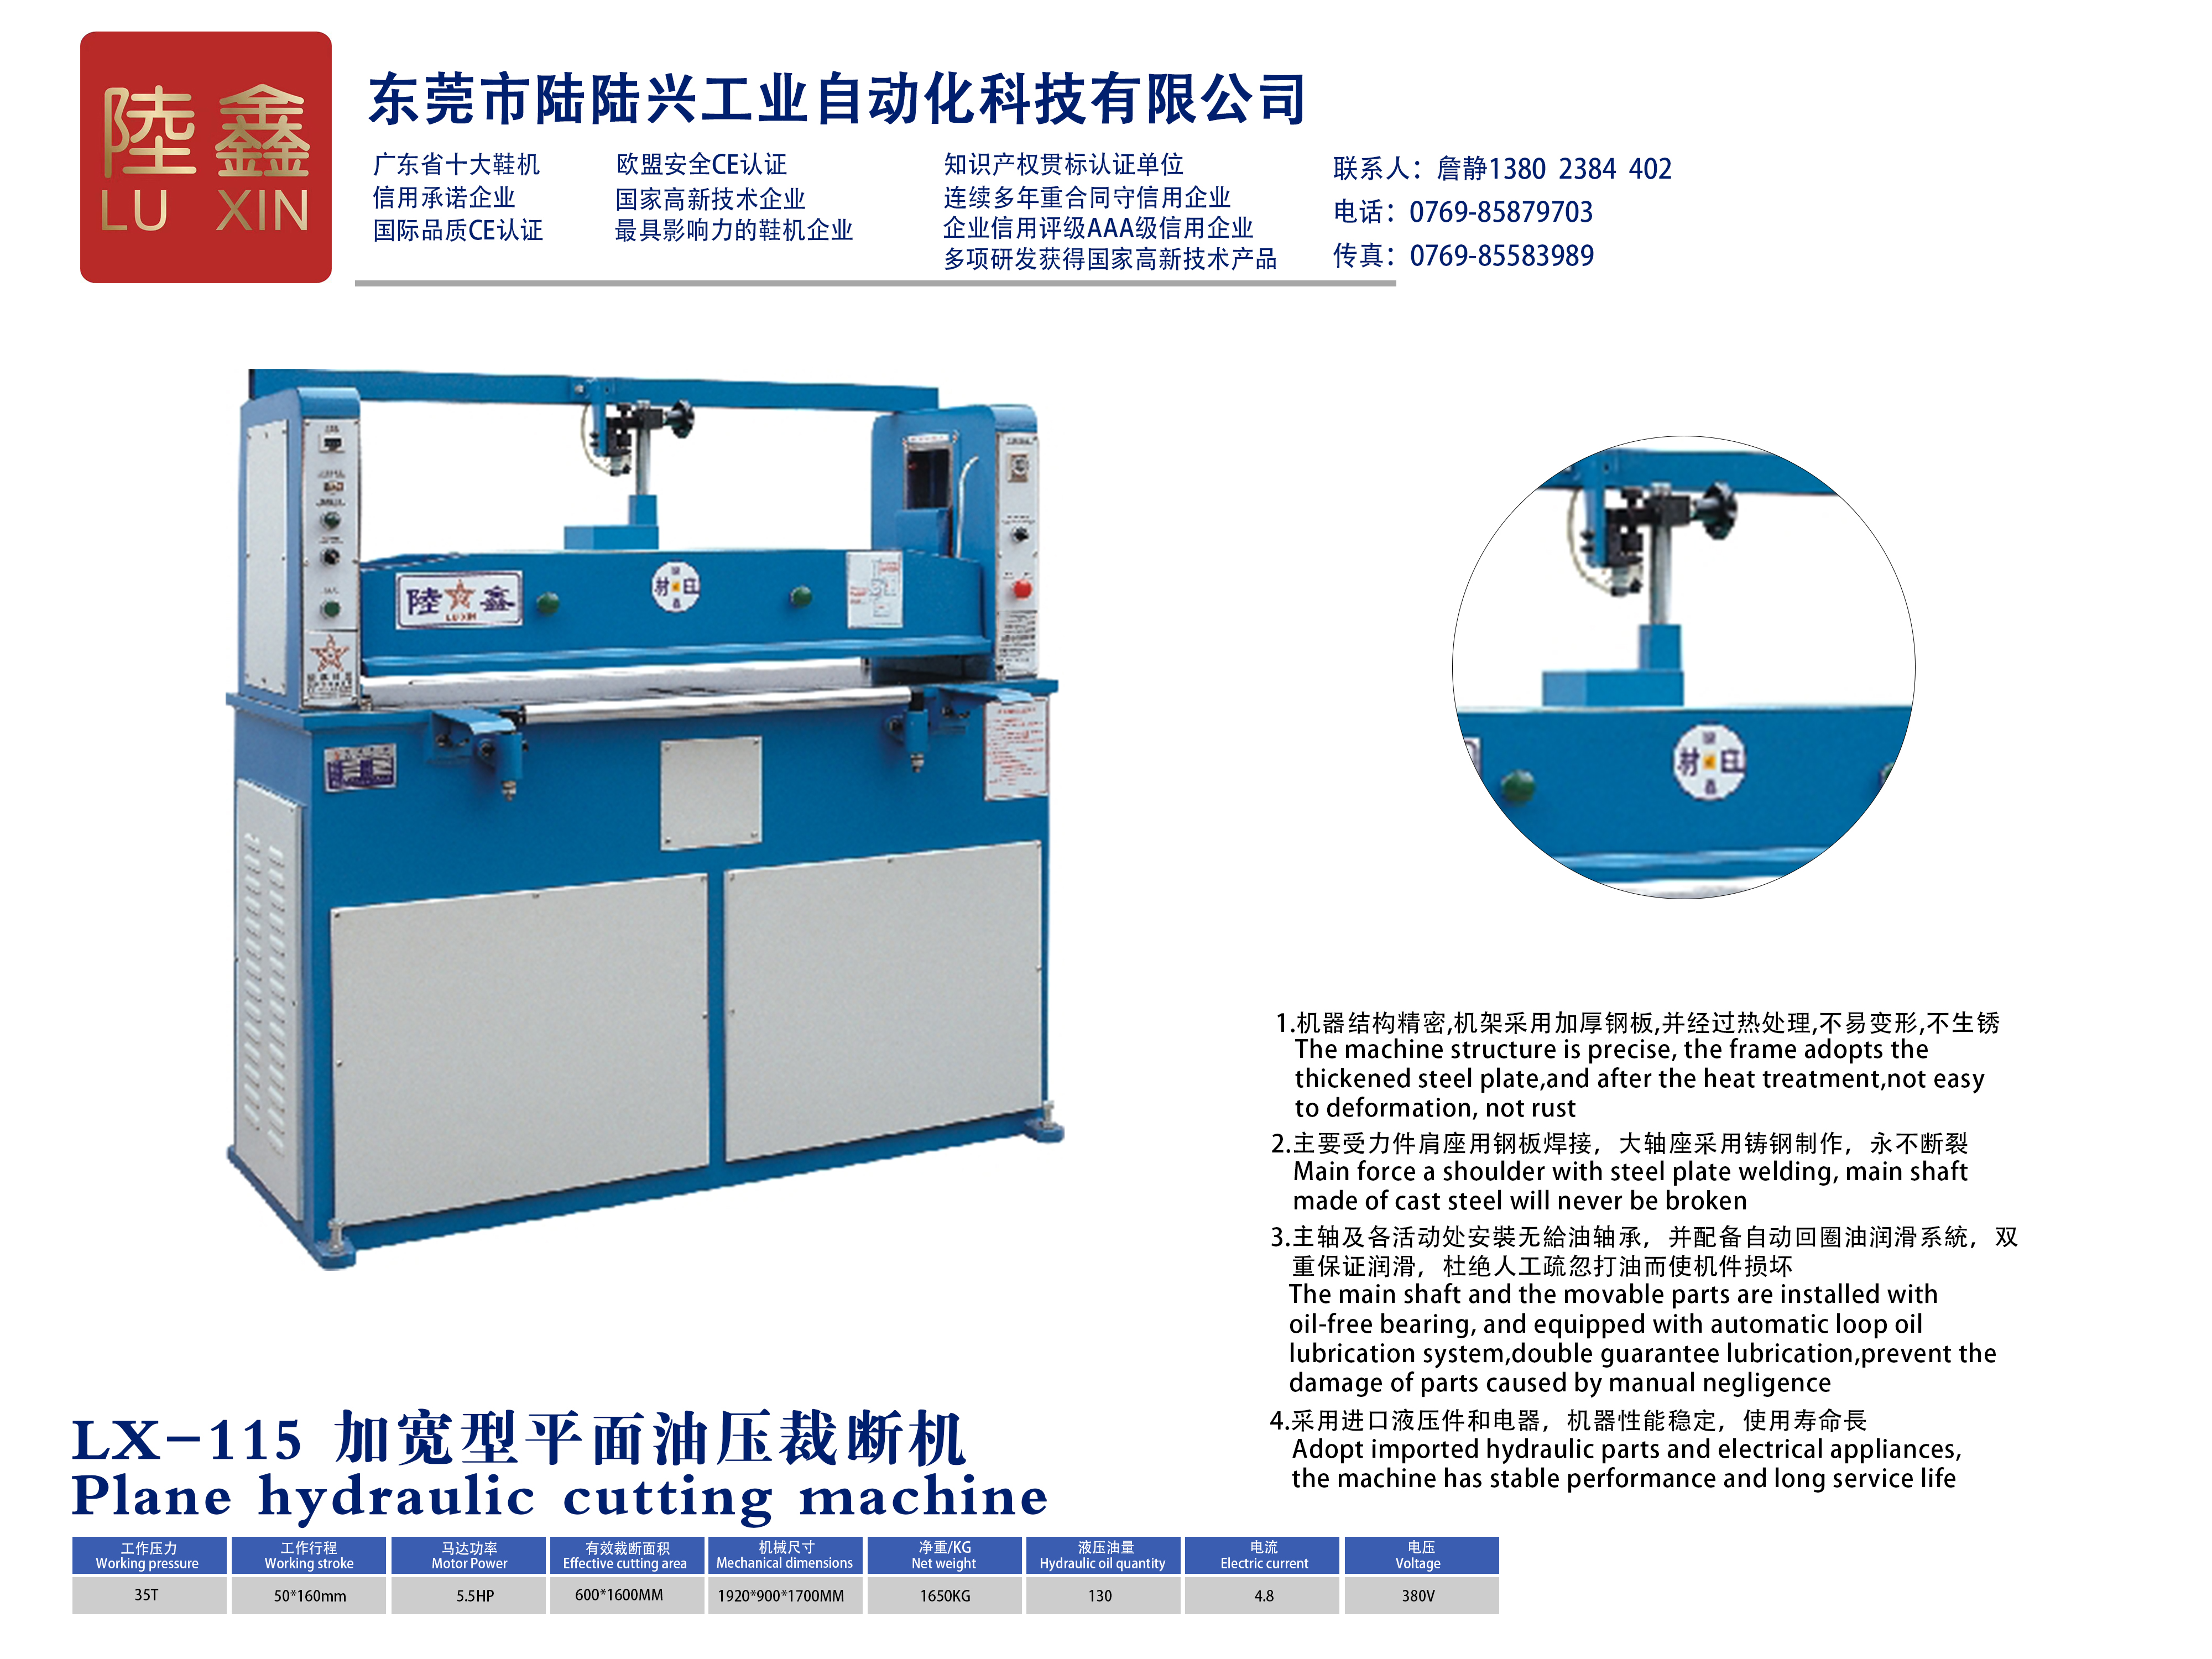 LX-115 加寬型平面油壓裁斷機